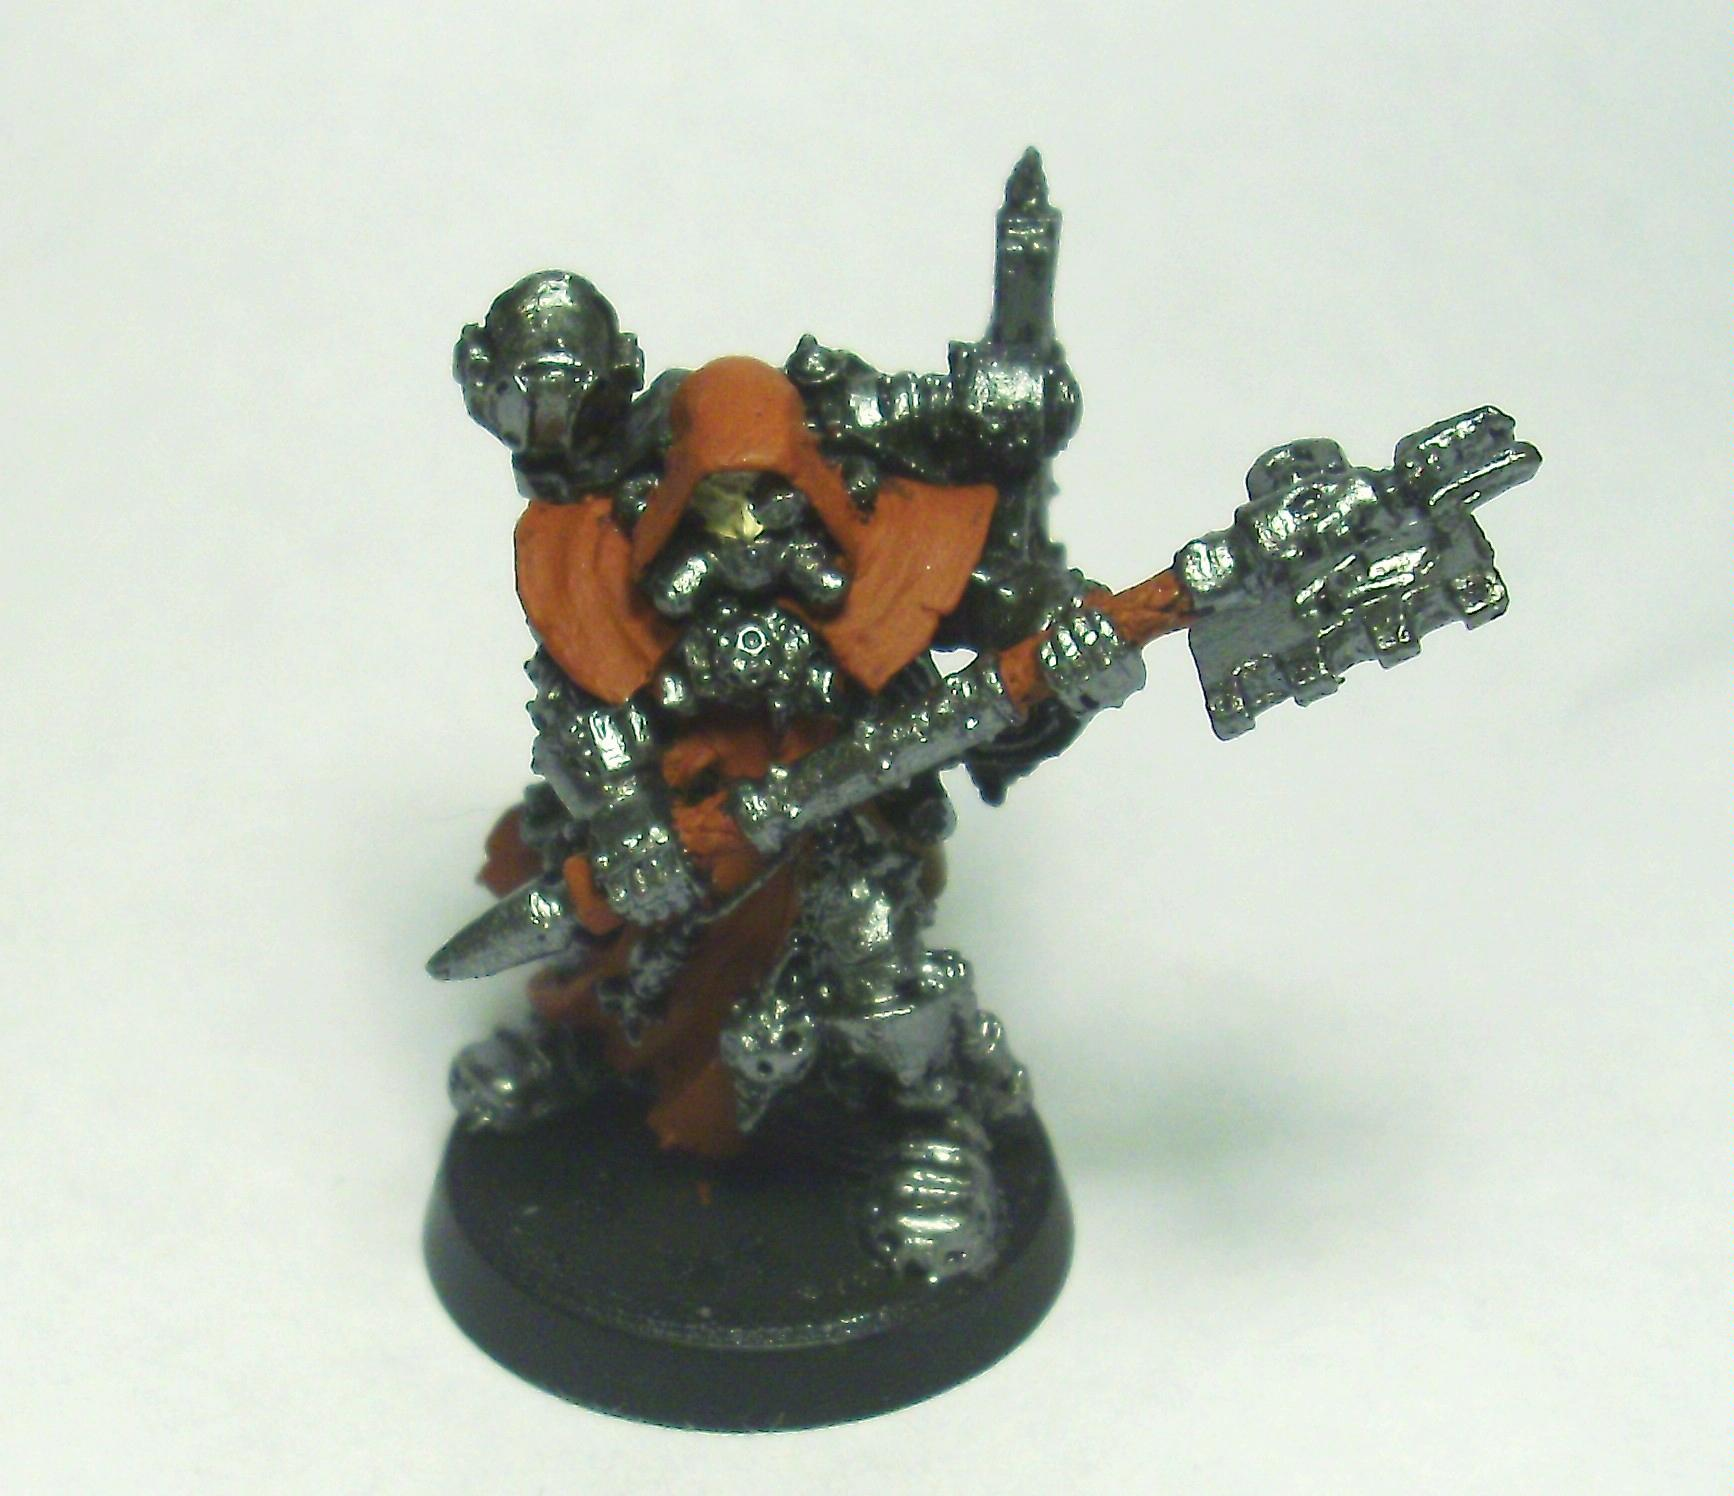 Metalus Varnius the Tech-Priest (WIP)